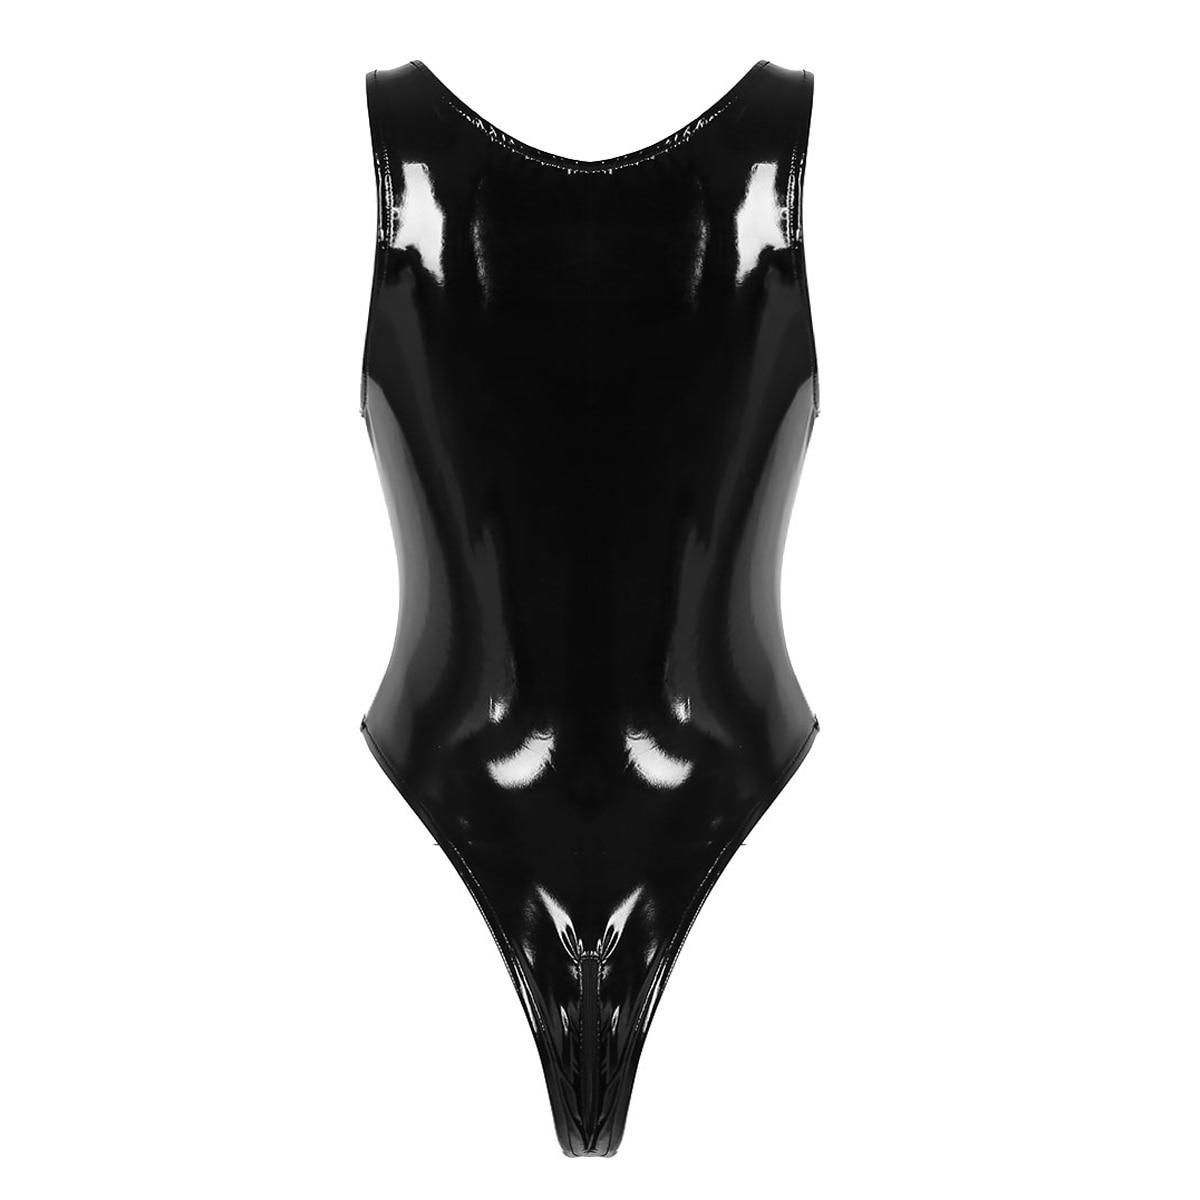 Womens Lingerie Sexy Bodysuit Open Crotch Zipper Bodystocking Sissy Bust Latex See-through Babydoll High Cut Teddy Body Suit 2